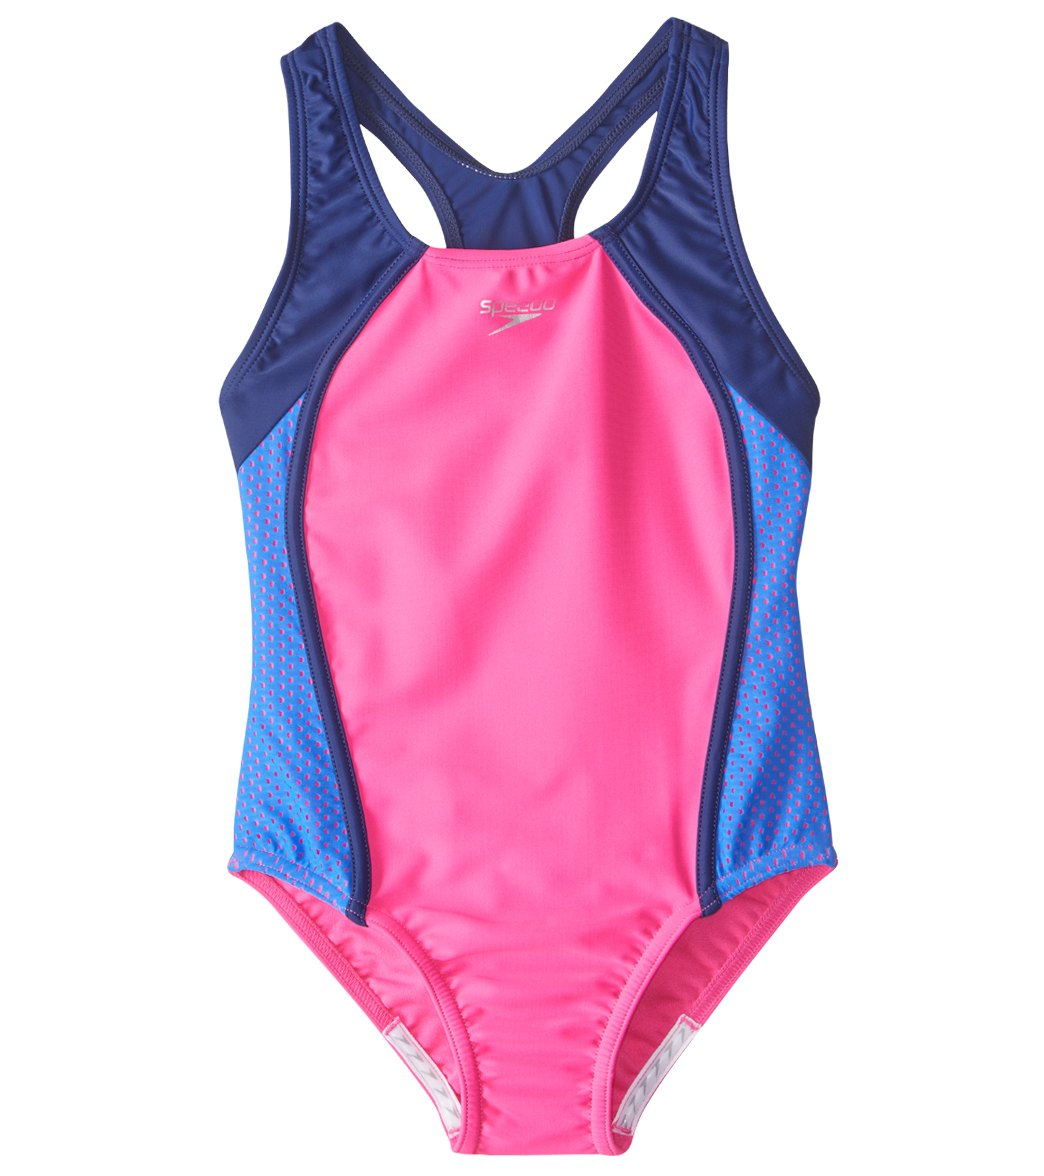 09d529f4a Speedo Girls' Mesh Splice Thick Strap One Piece Swimsuit (7yrs-16yrs)